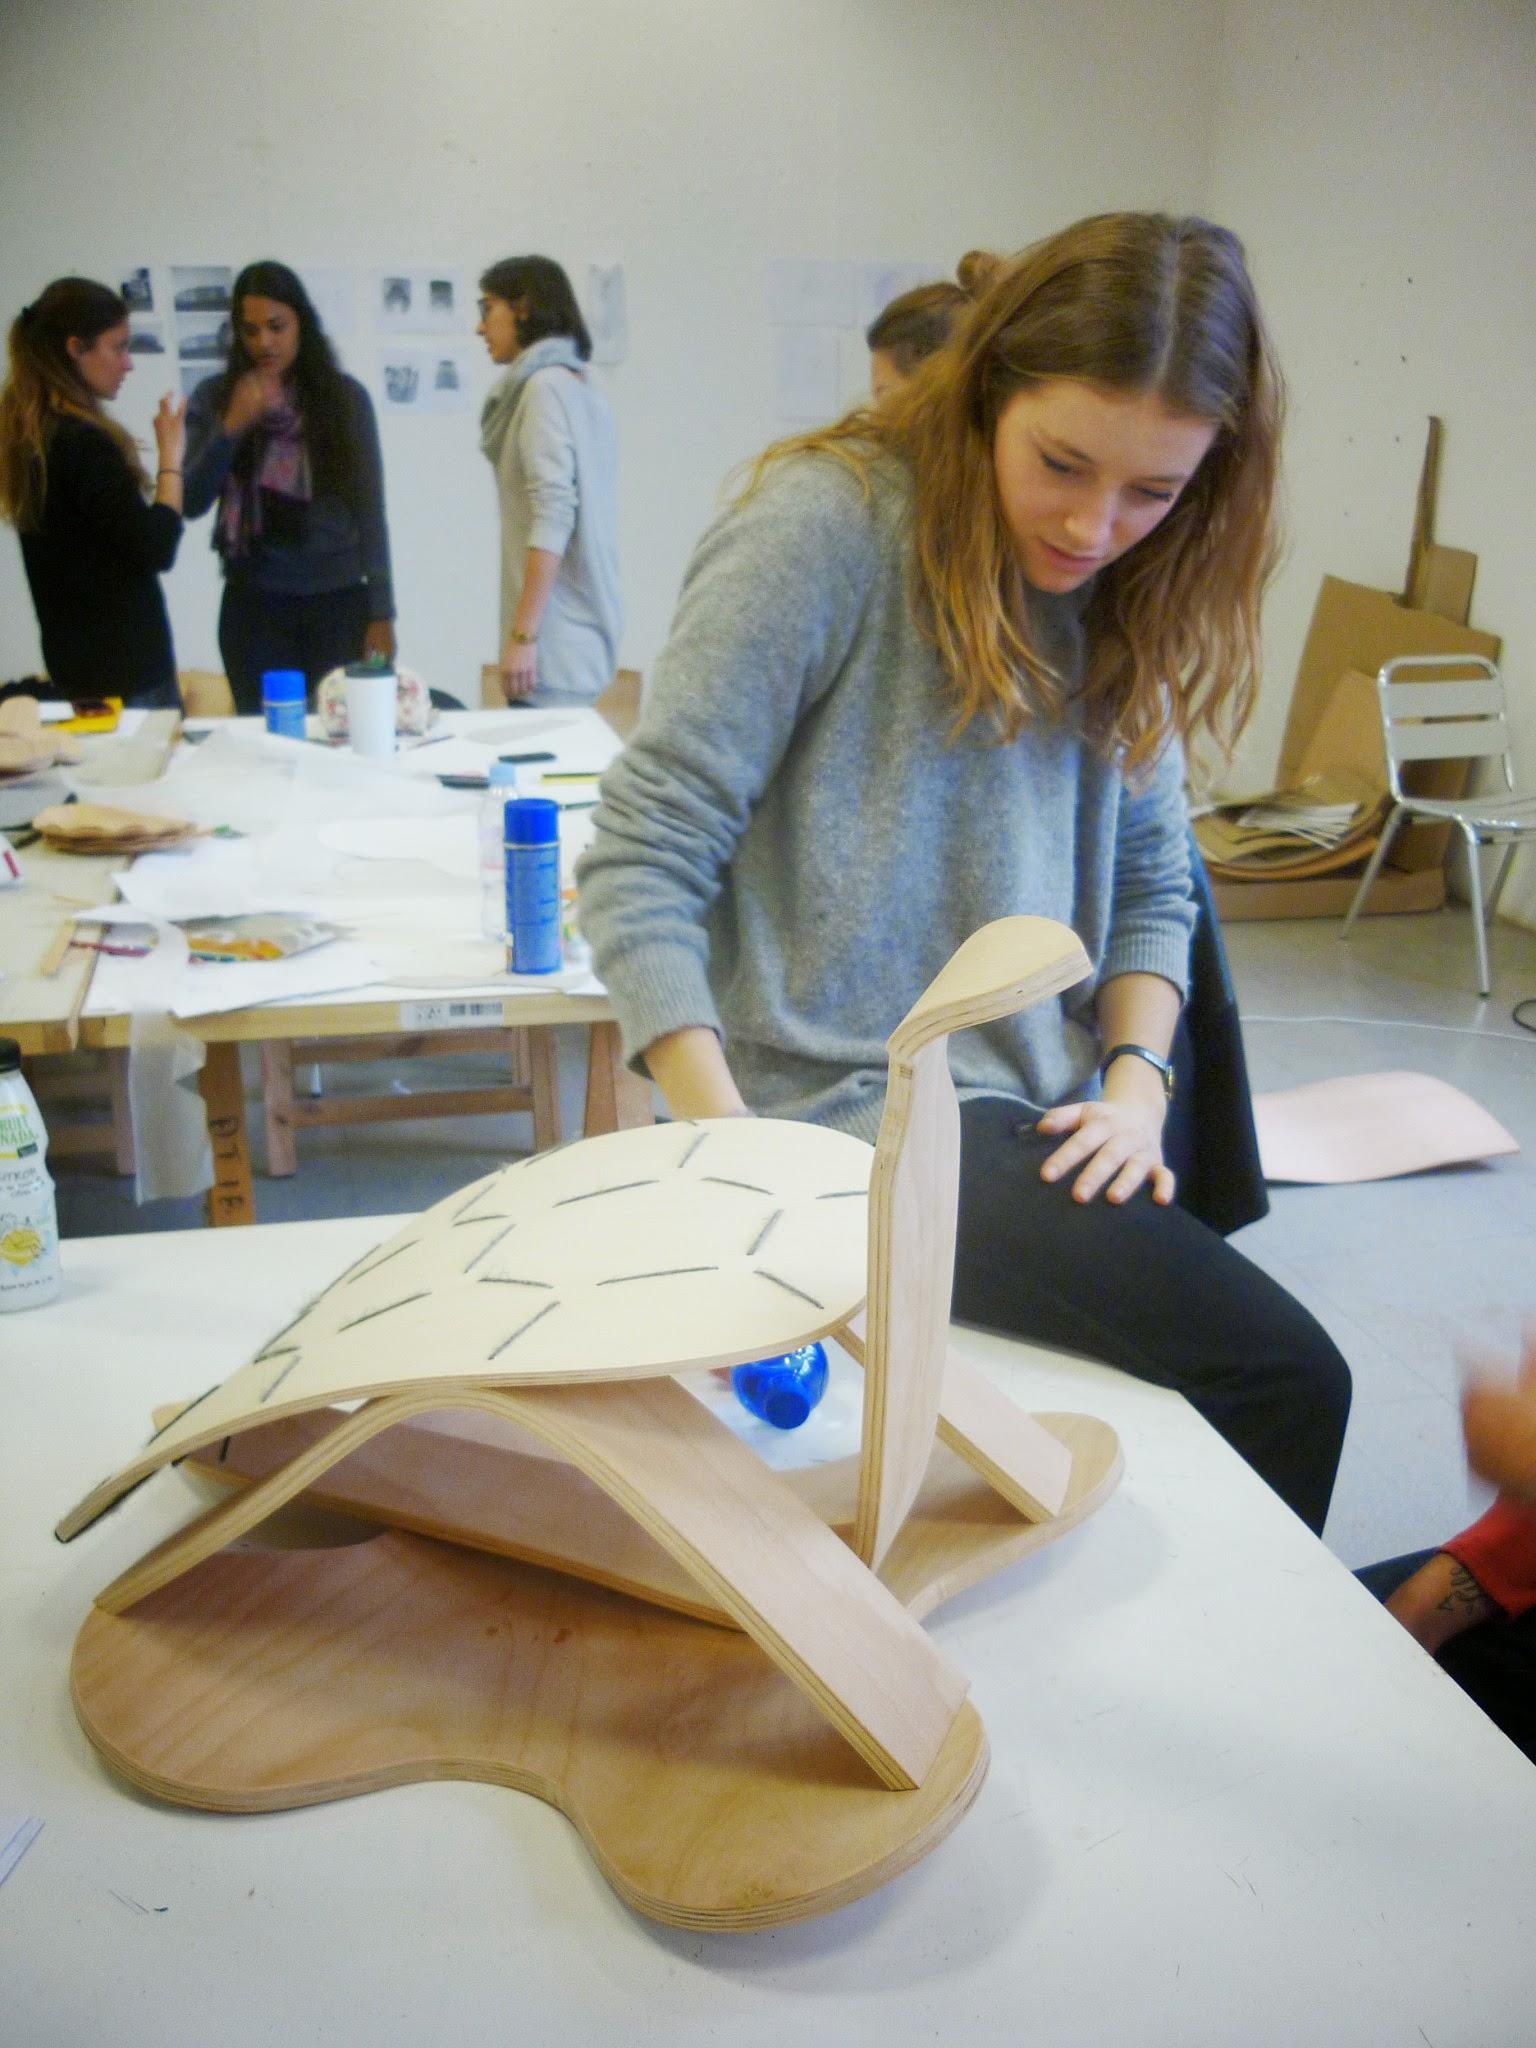 Agathe Le Cornec - Jean-Marc Cnockaert - Sköldpadda - Fabrication